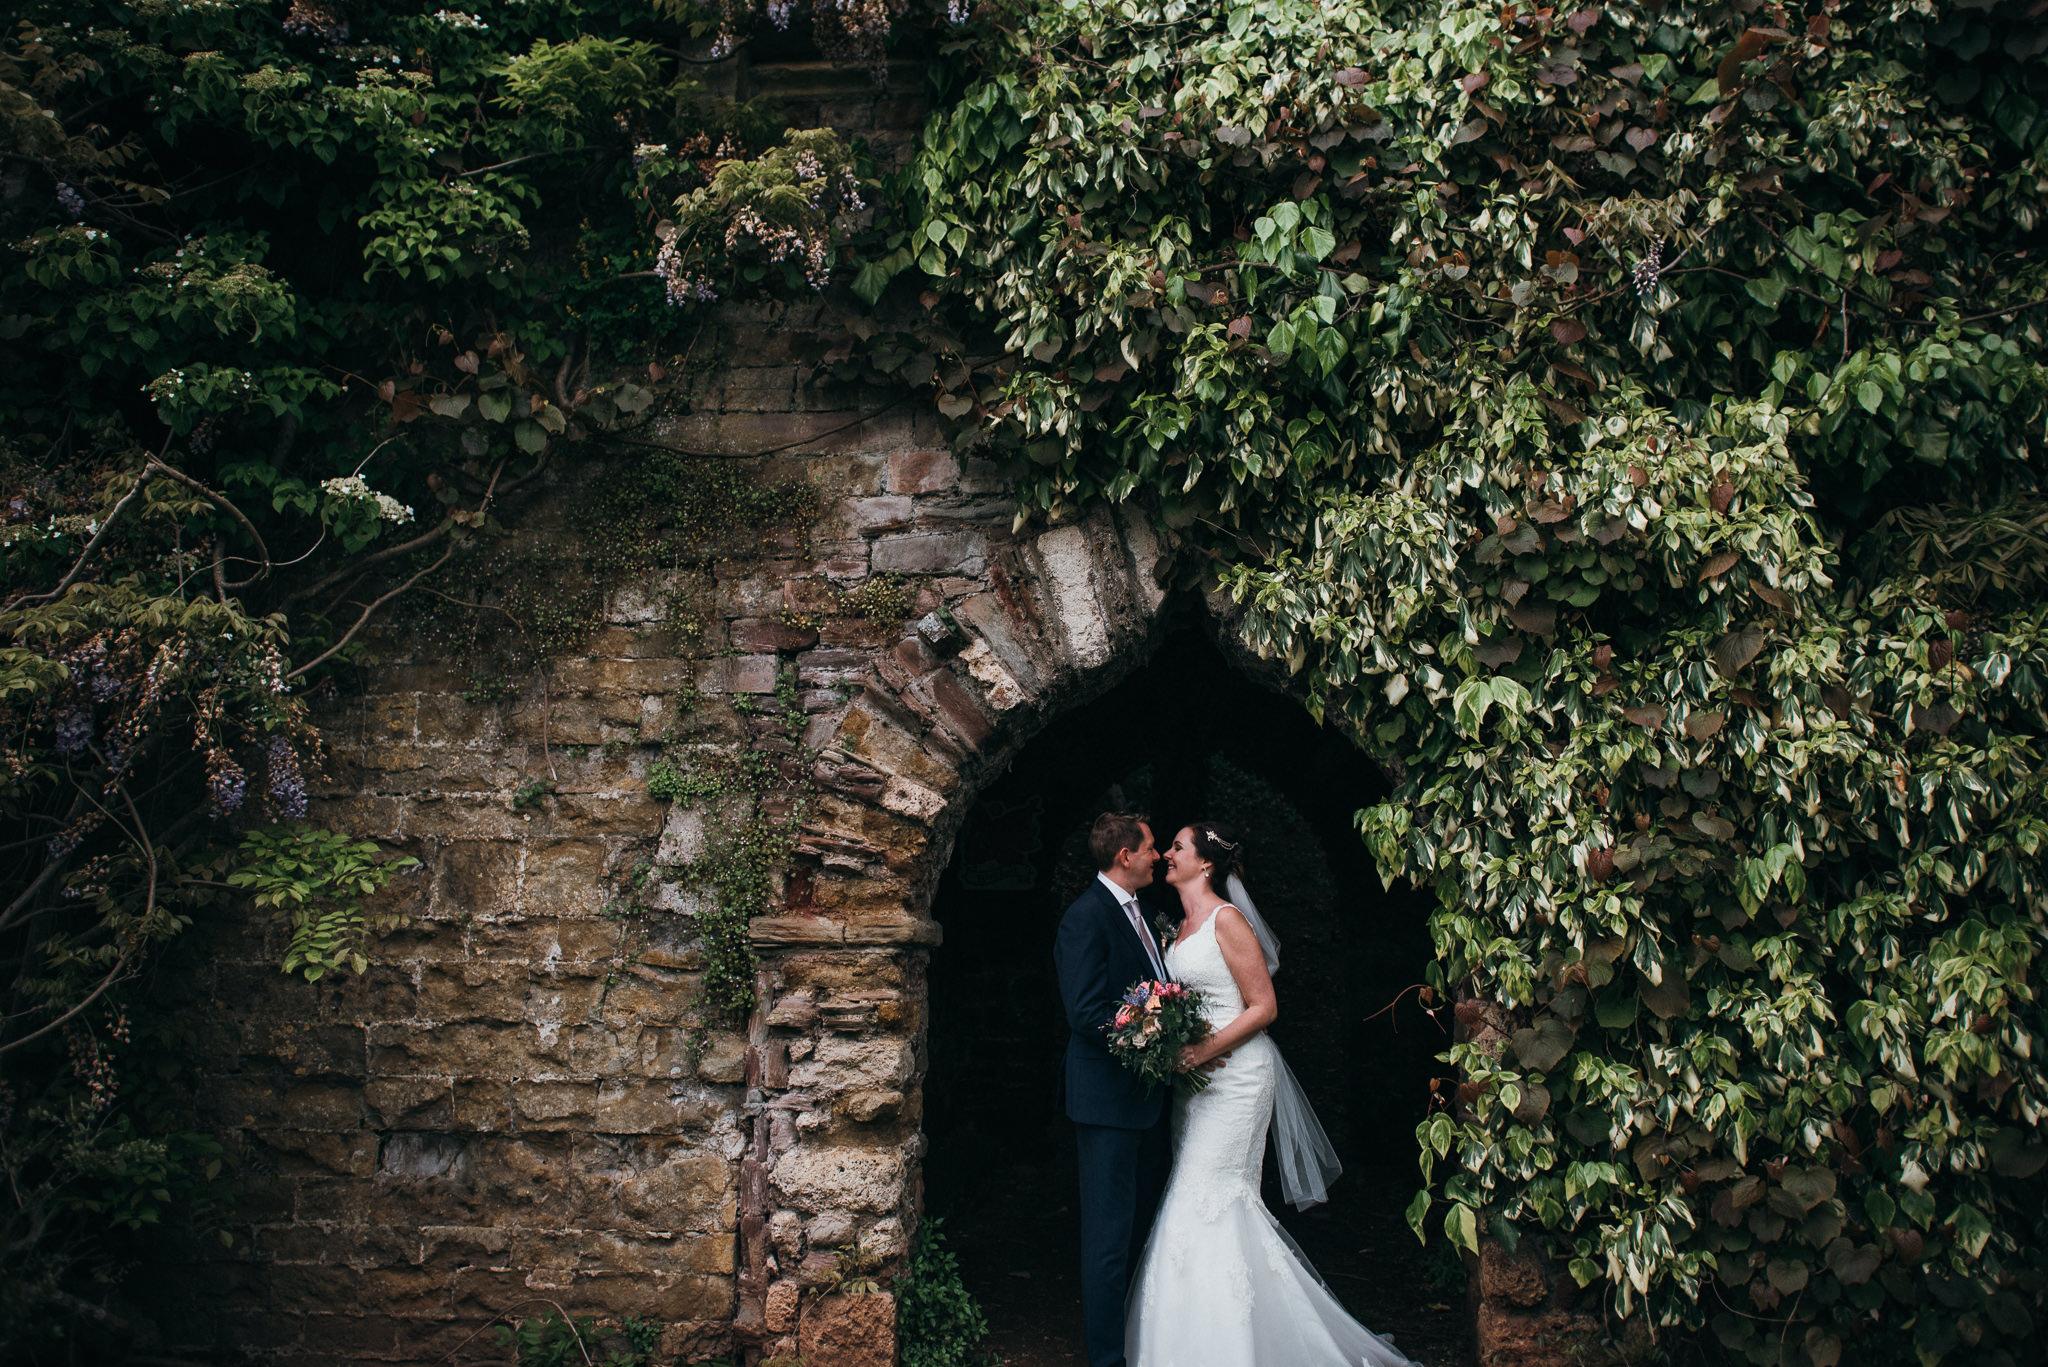 Berkeley castle wedding captured by simon biffen photography 4